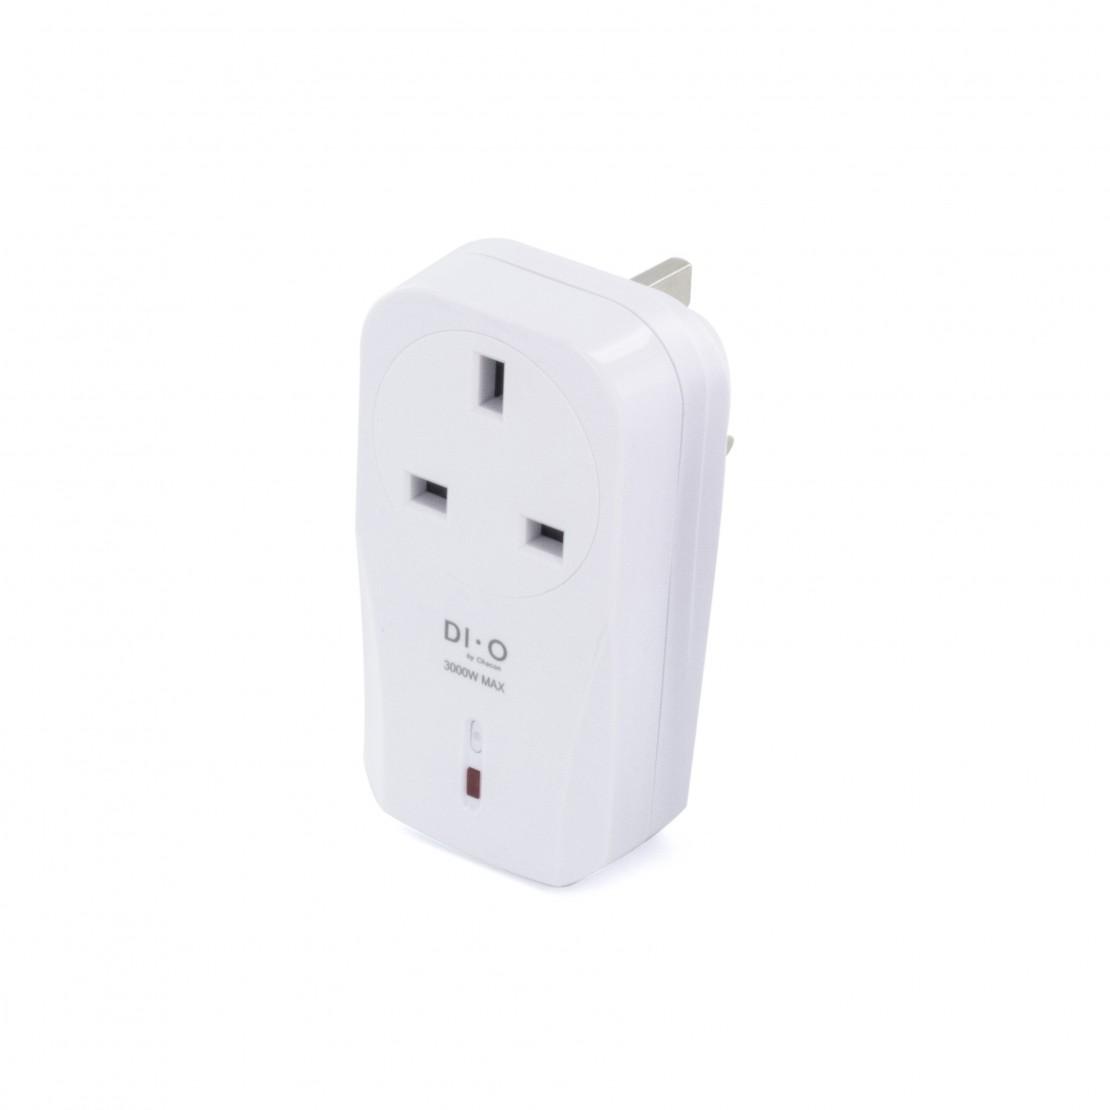 On/off socket (3000 W, UK)